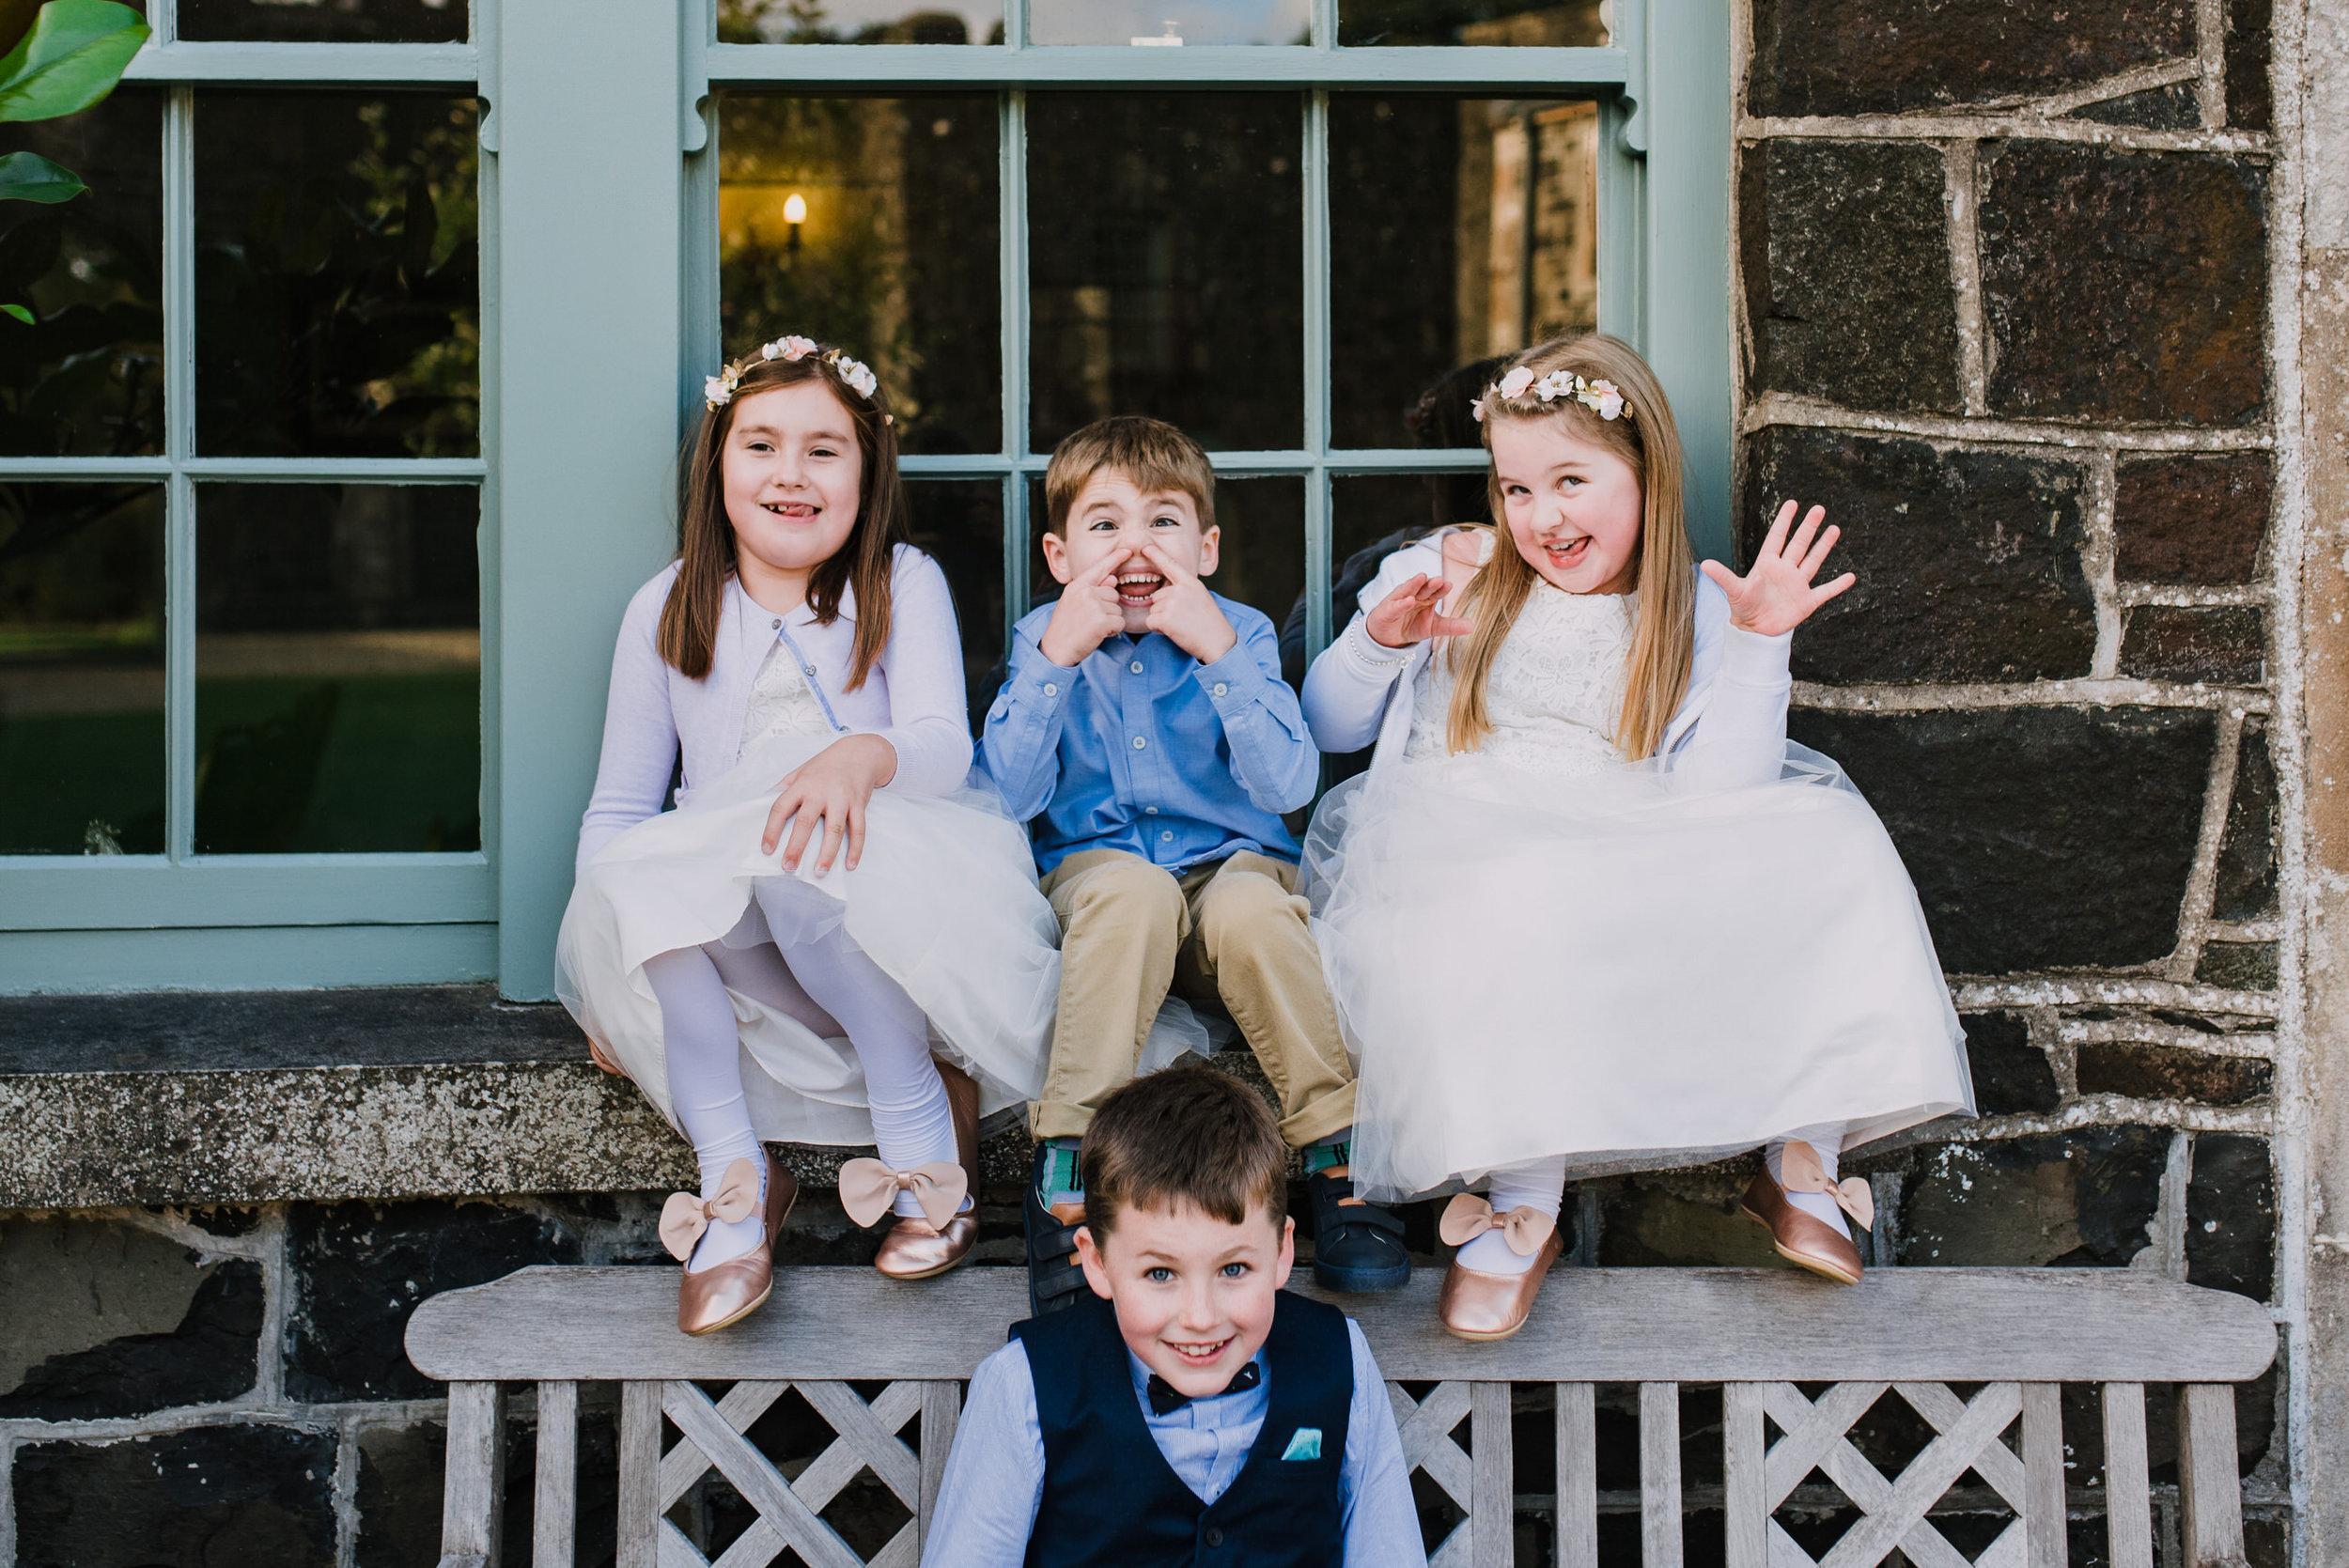 lissanoure castle wedding, northern ireland wedding photographer, romantic northern irish wedding venue, castle wedding ireland, natural wedding photography ni (99).jpg